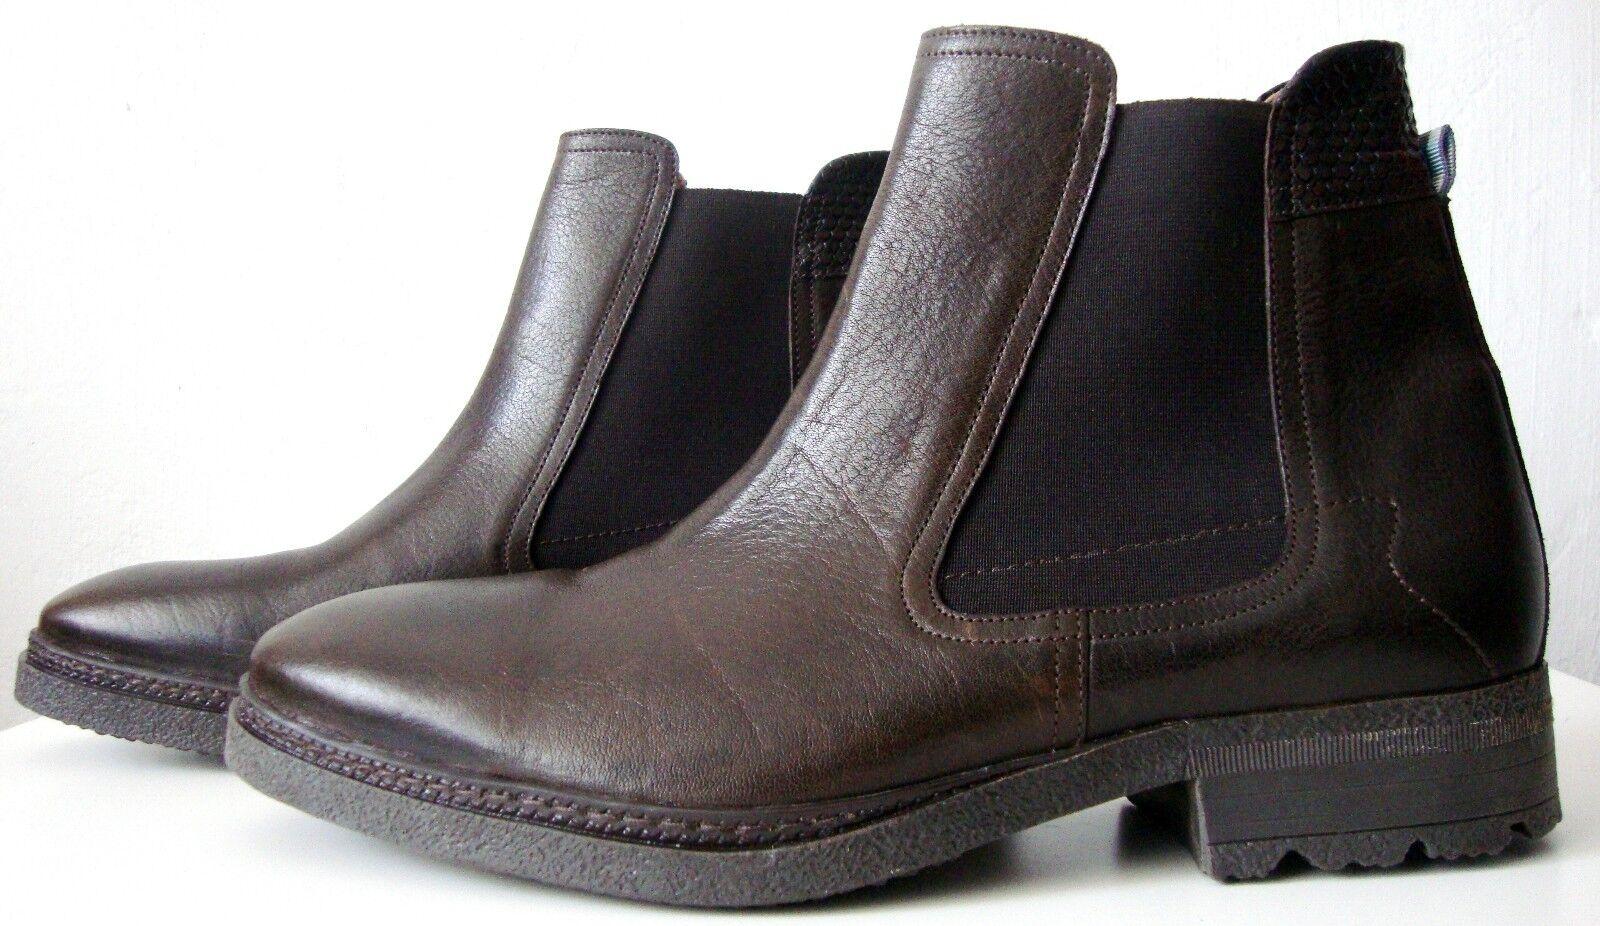 FLORIS FLORIS FLORIS VAN BOMMEL Stiefel Herren Stiefel Stiefelette Schuhe Halbschuhe Gr.43 NEU  c3741e